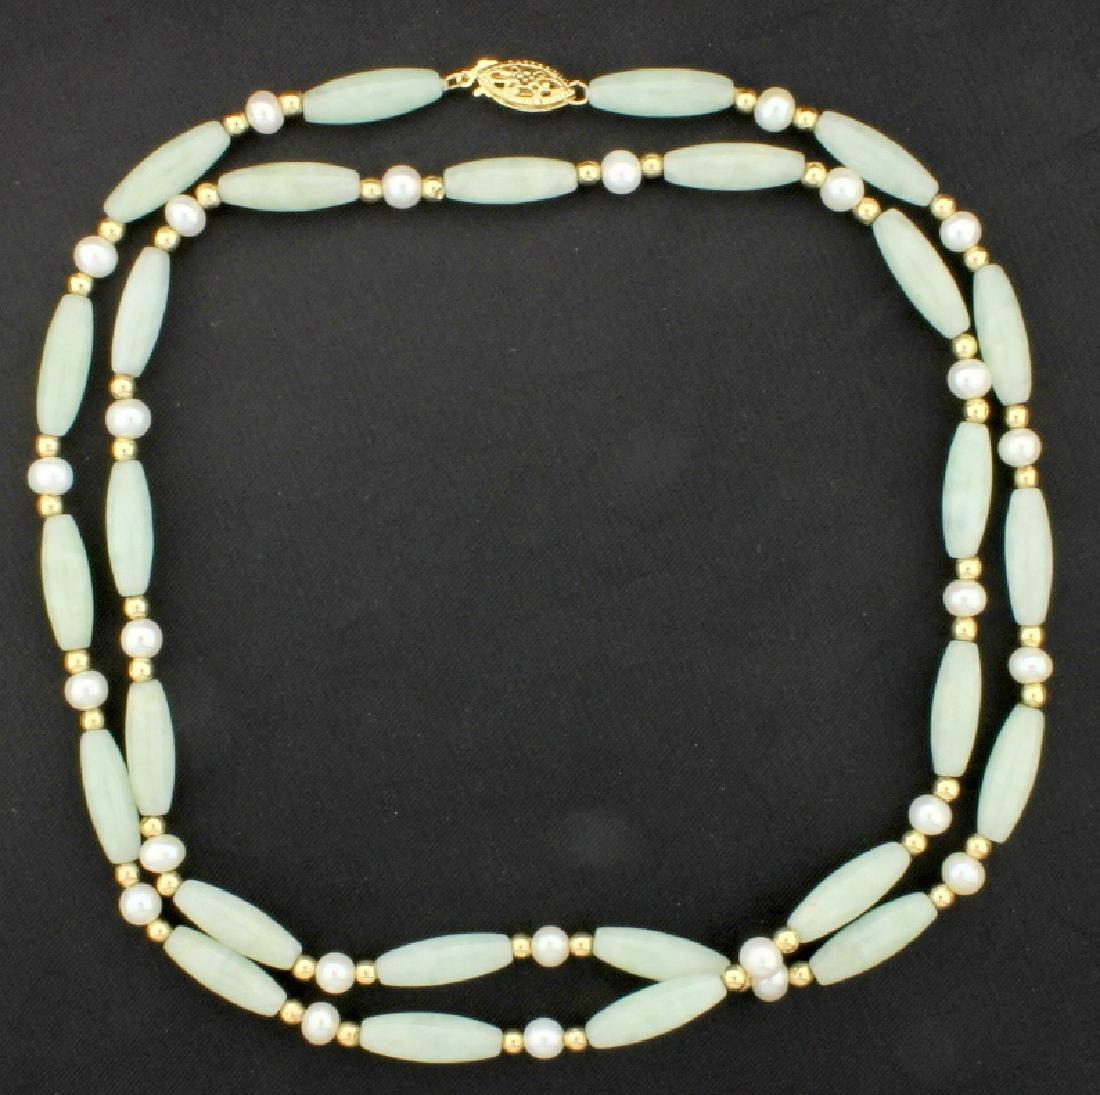 26 1/2 Inch Jade & Pearl Necklace